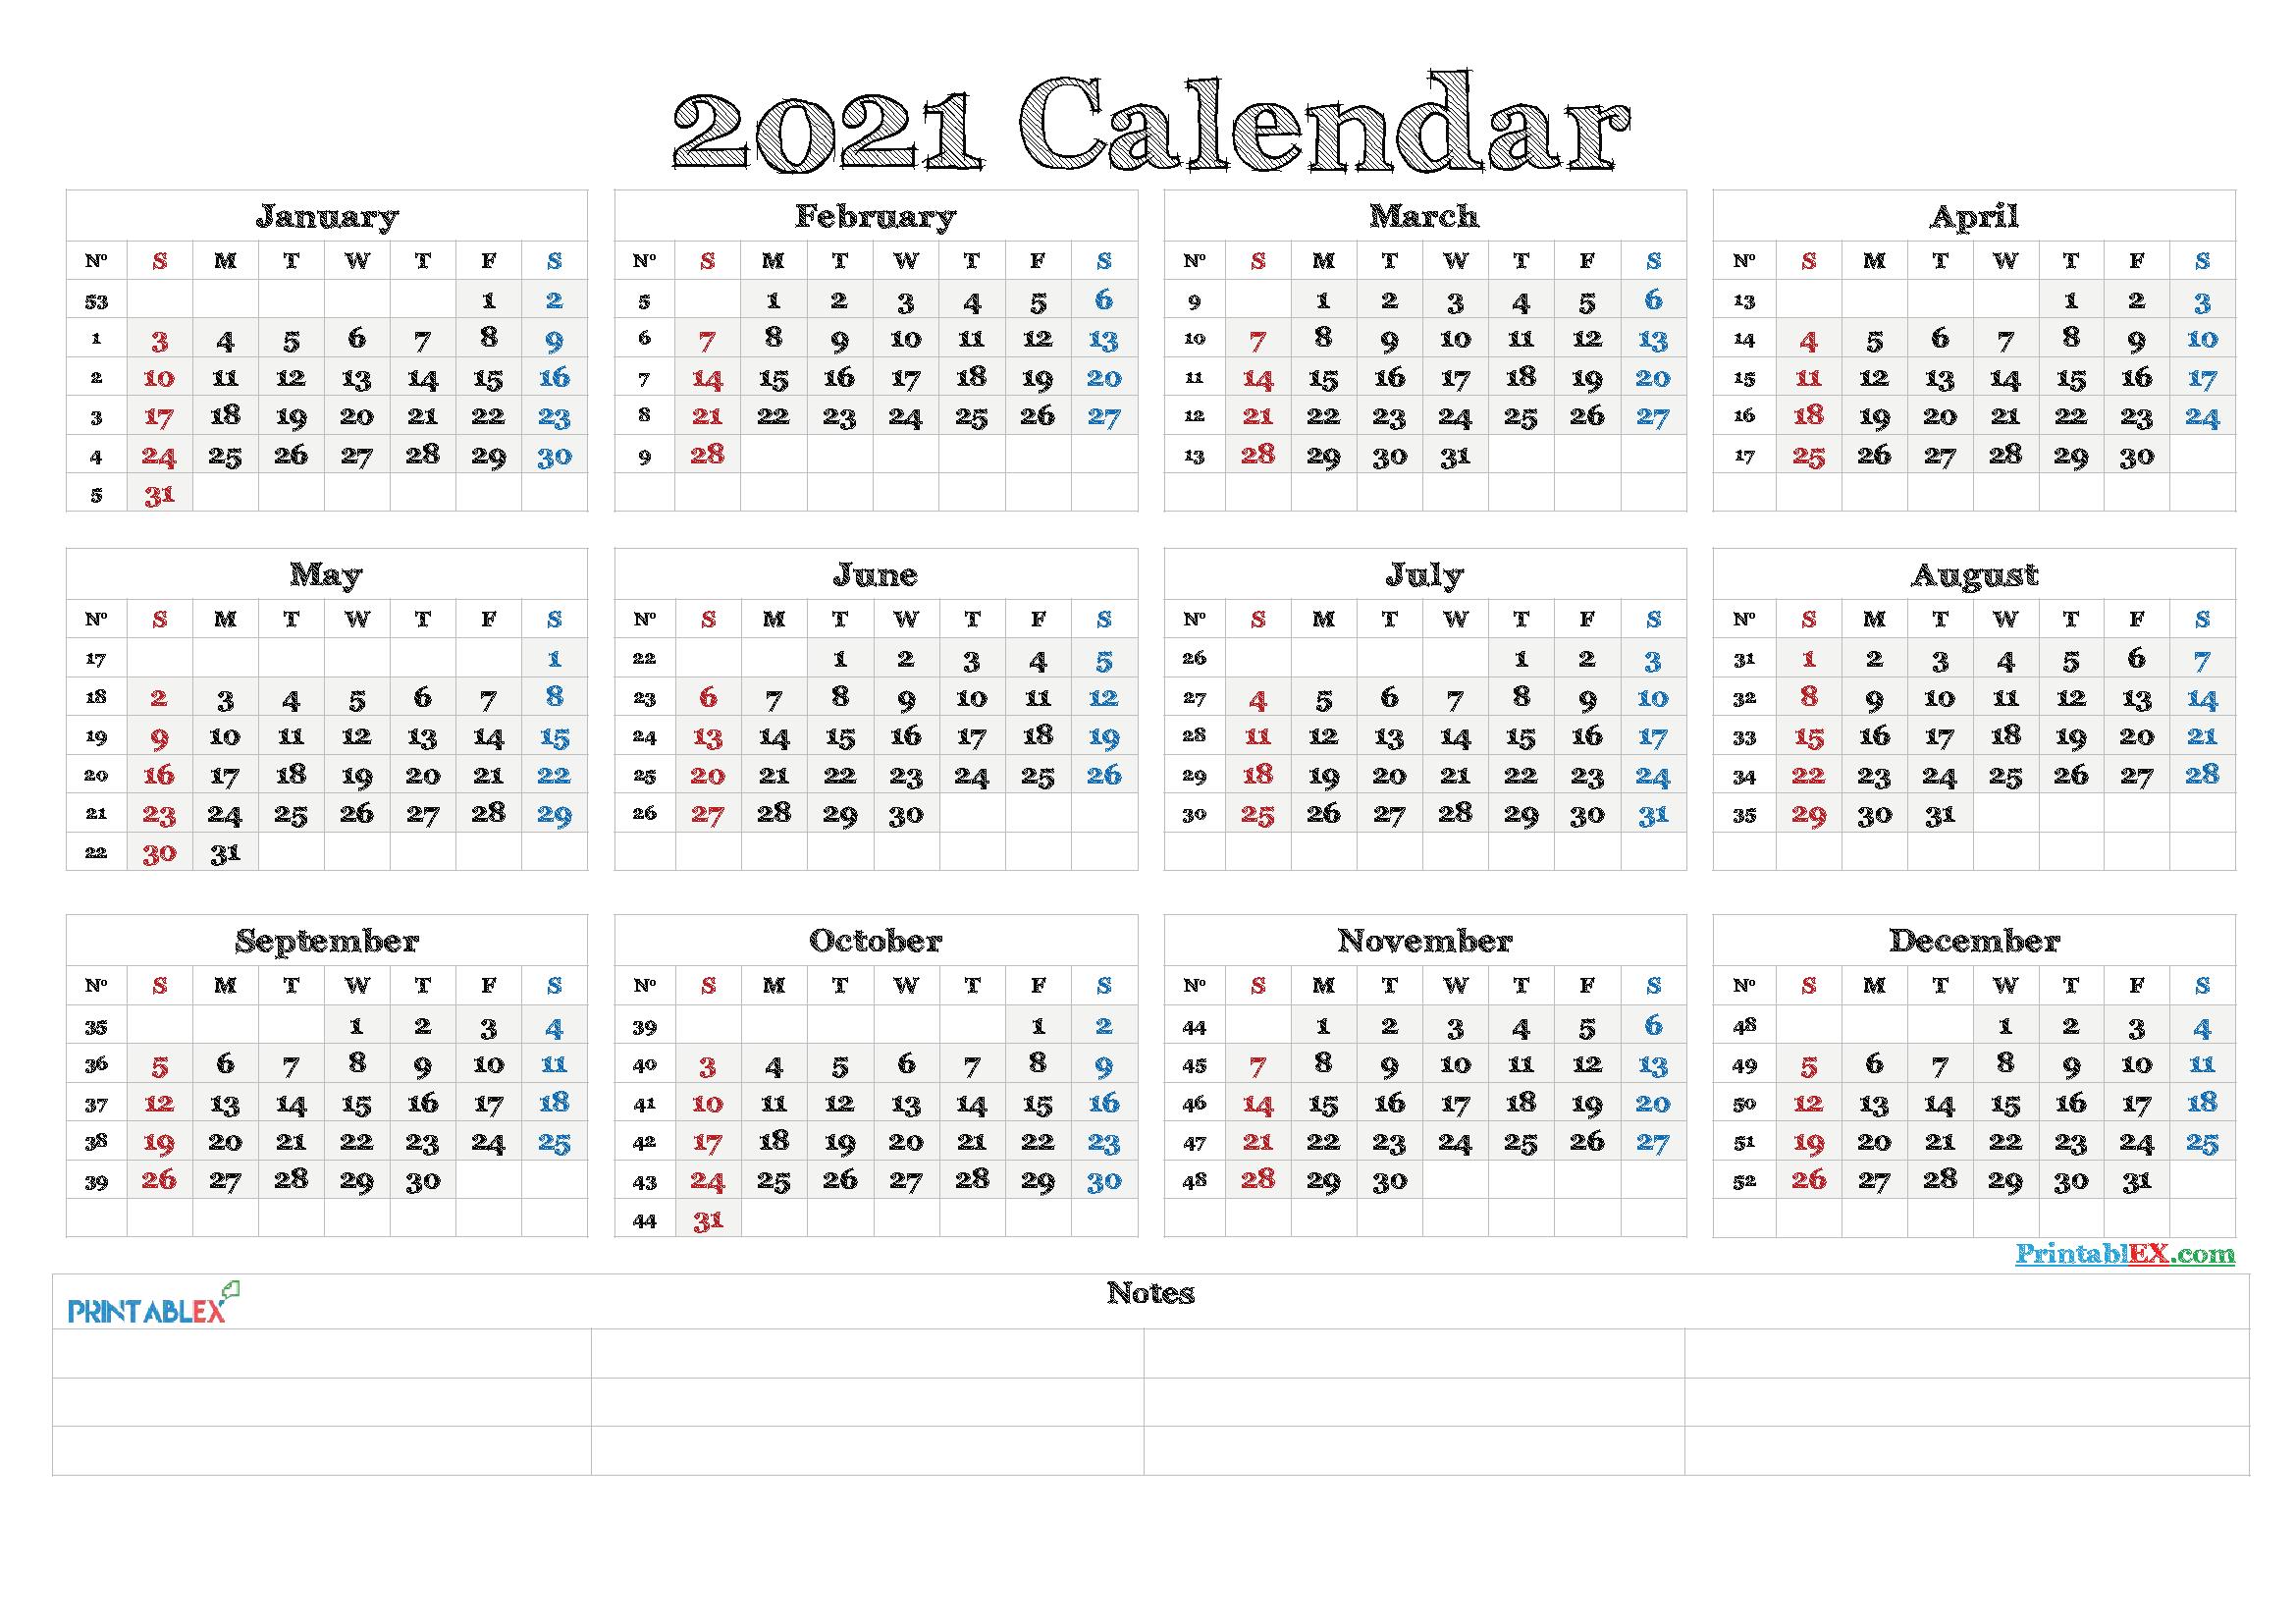 Printable Calendar Templates 2021 21ytw84 In 2020 Free Printable Calendar Templates Calendar Template Printable Calendar Template